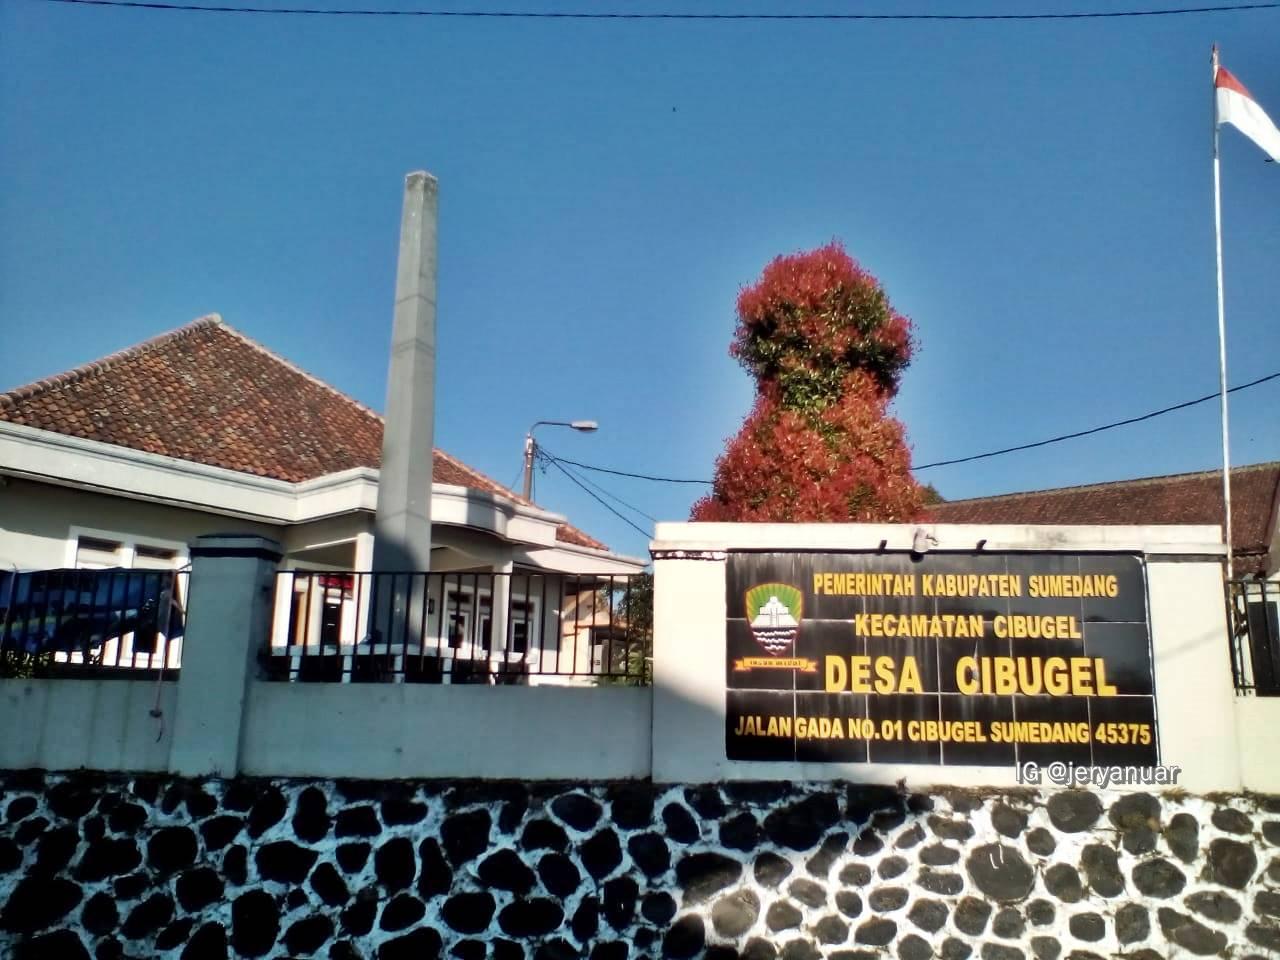 Kantor Desa Cibugel, Kab. Sumedang